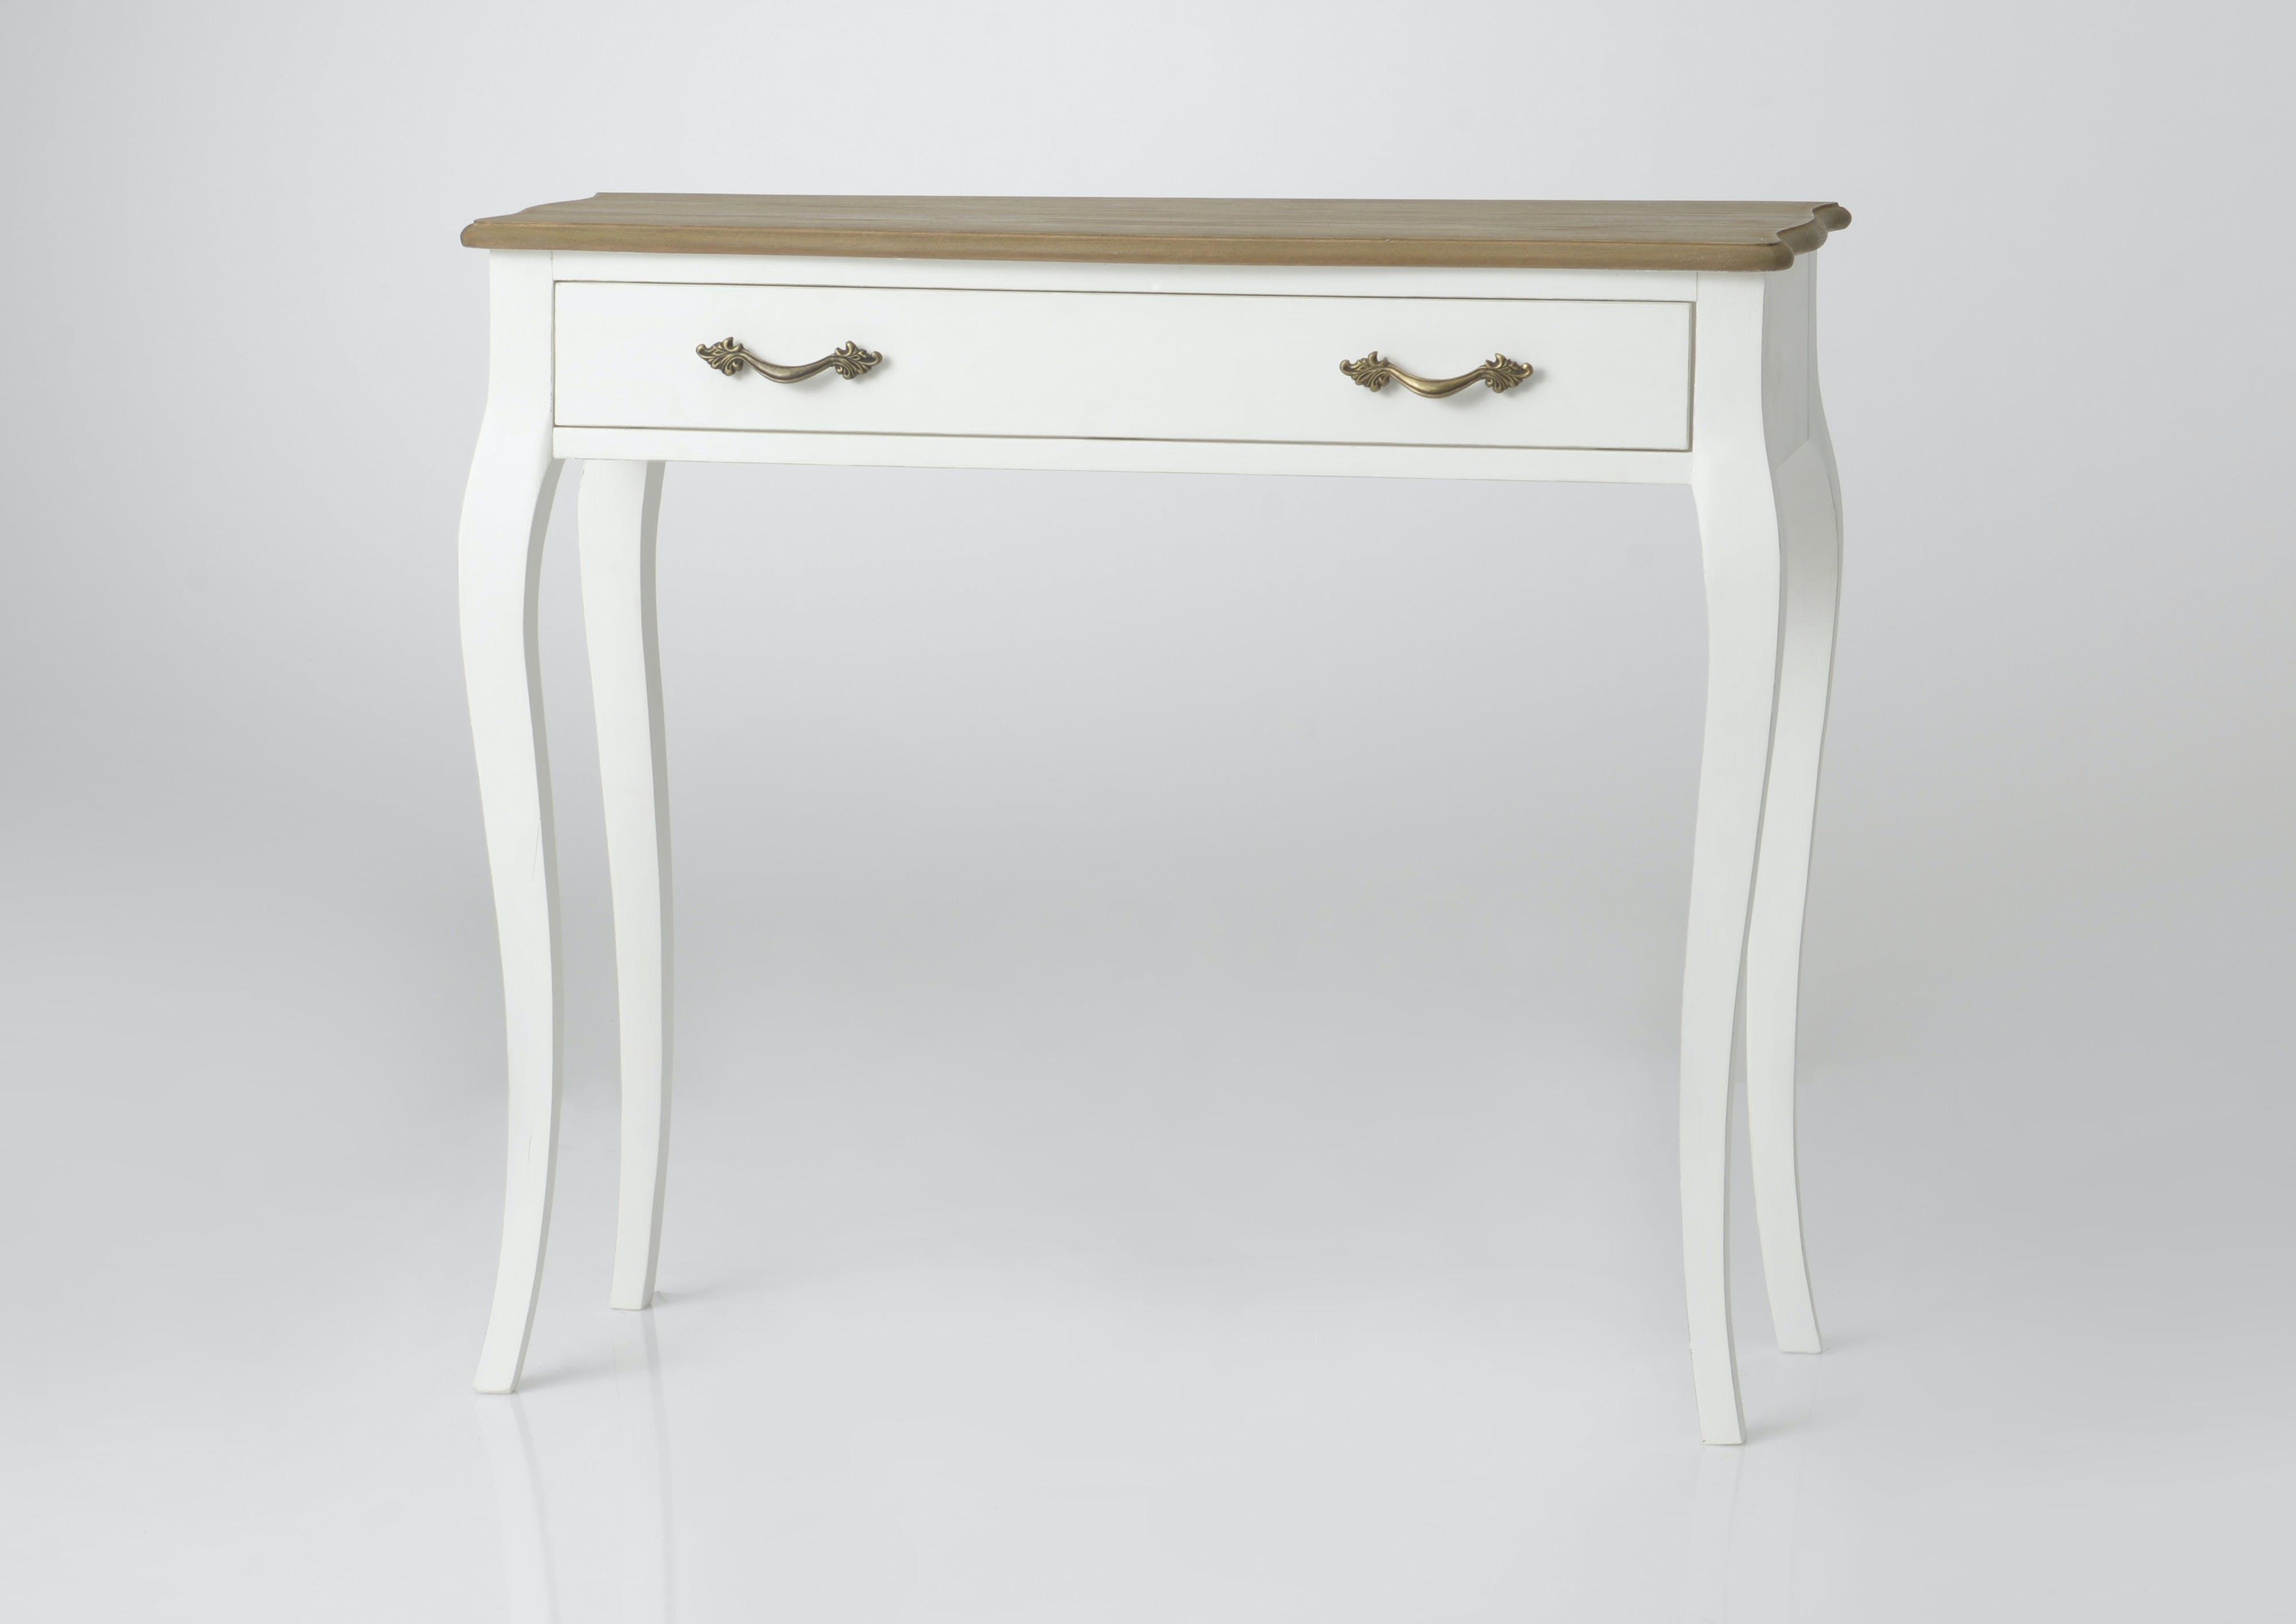 Console bois massif blanc 1 tiroir PRAGUE ref. 30020693